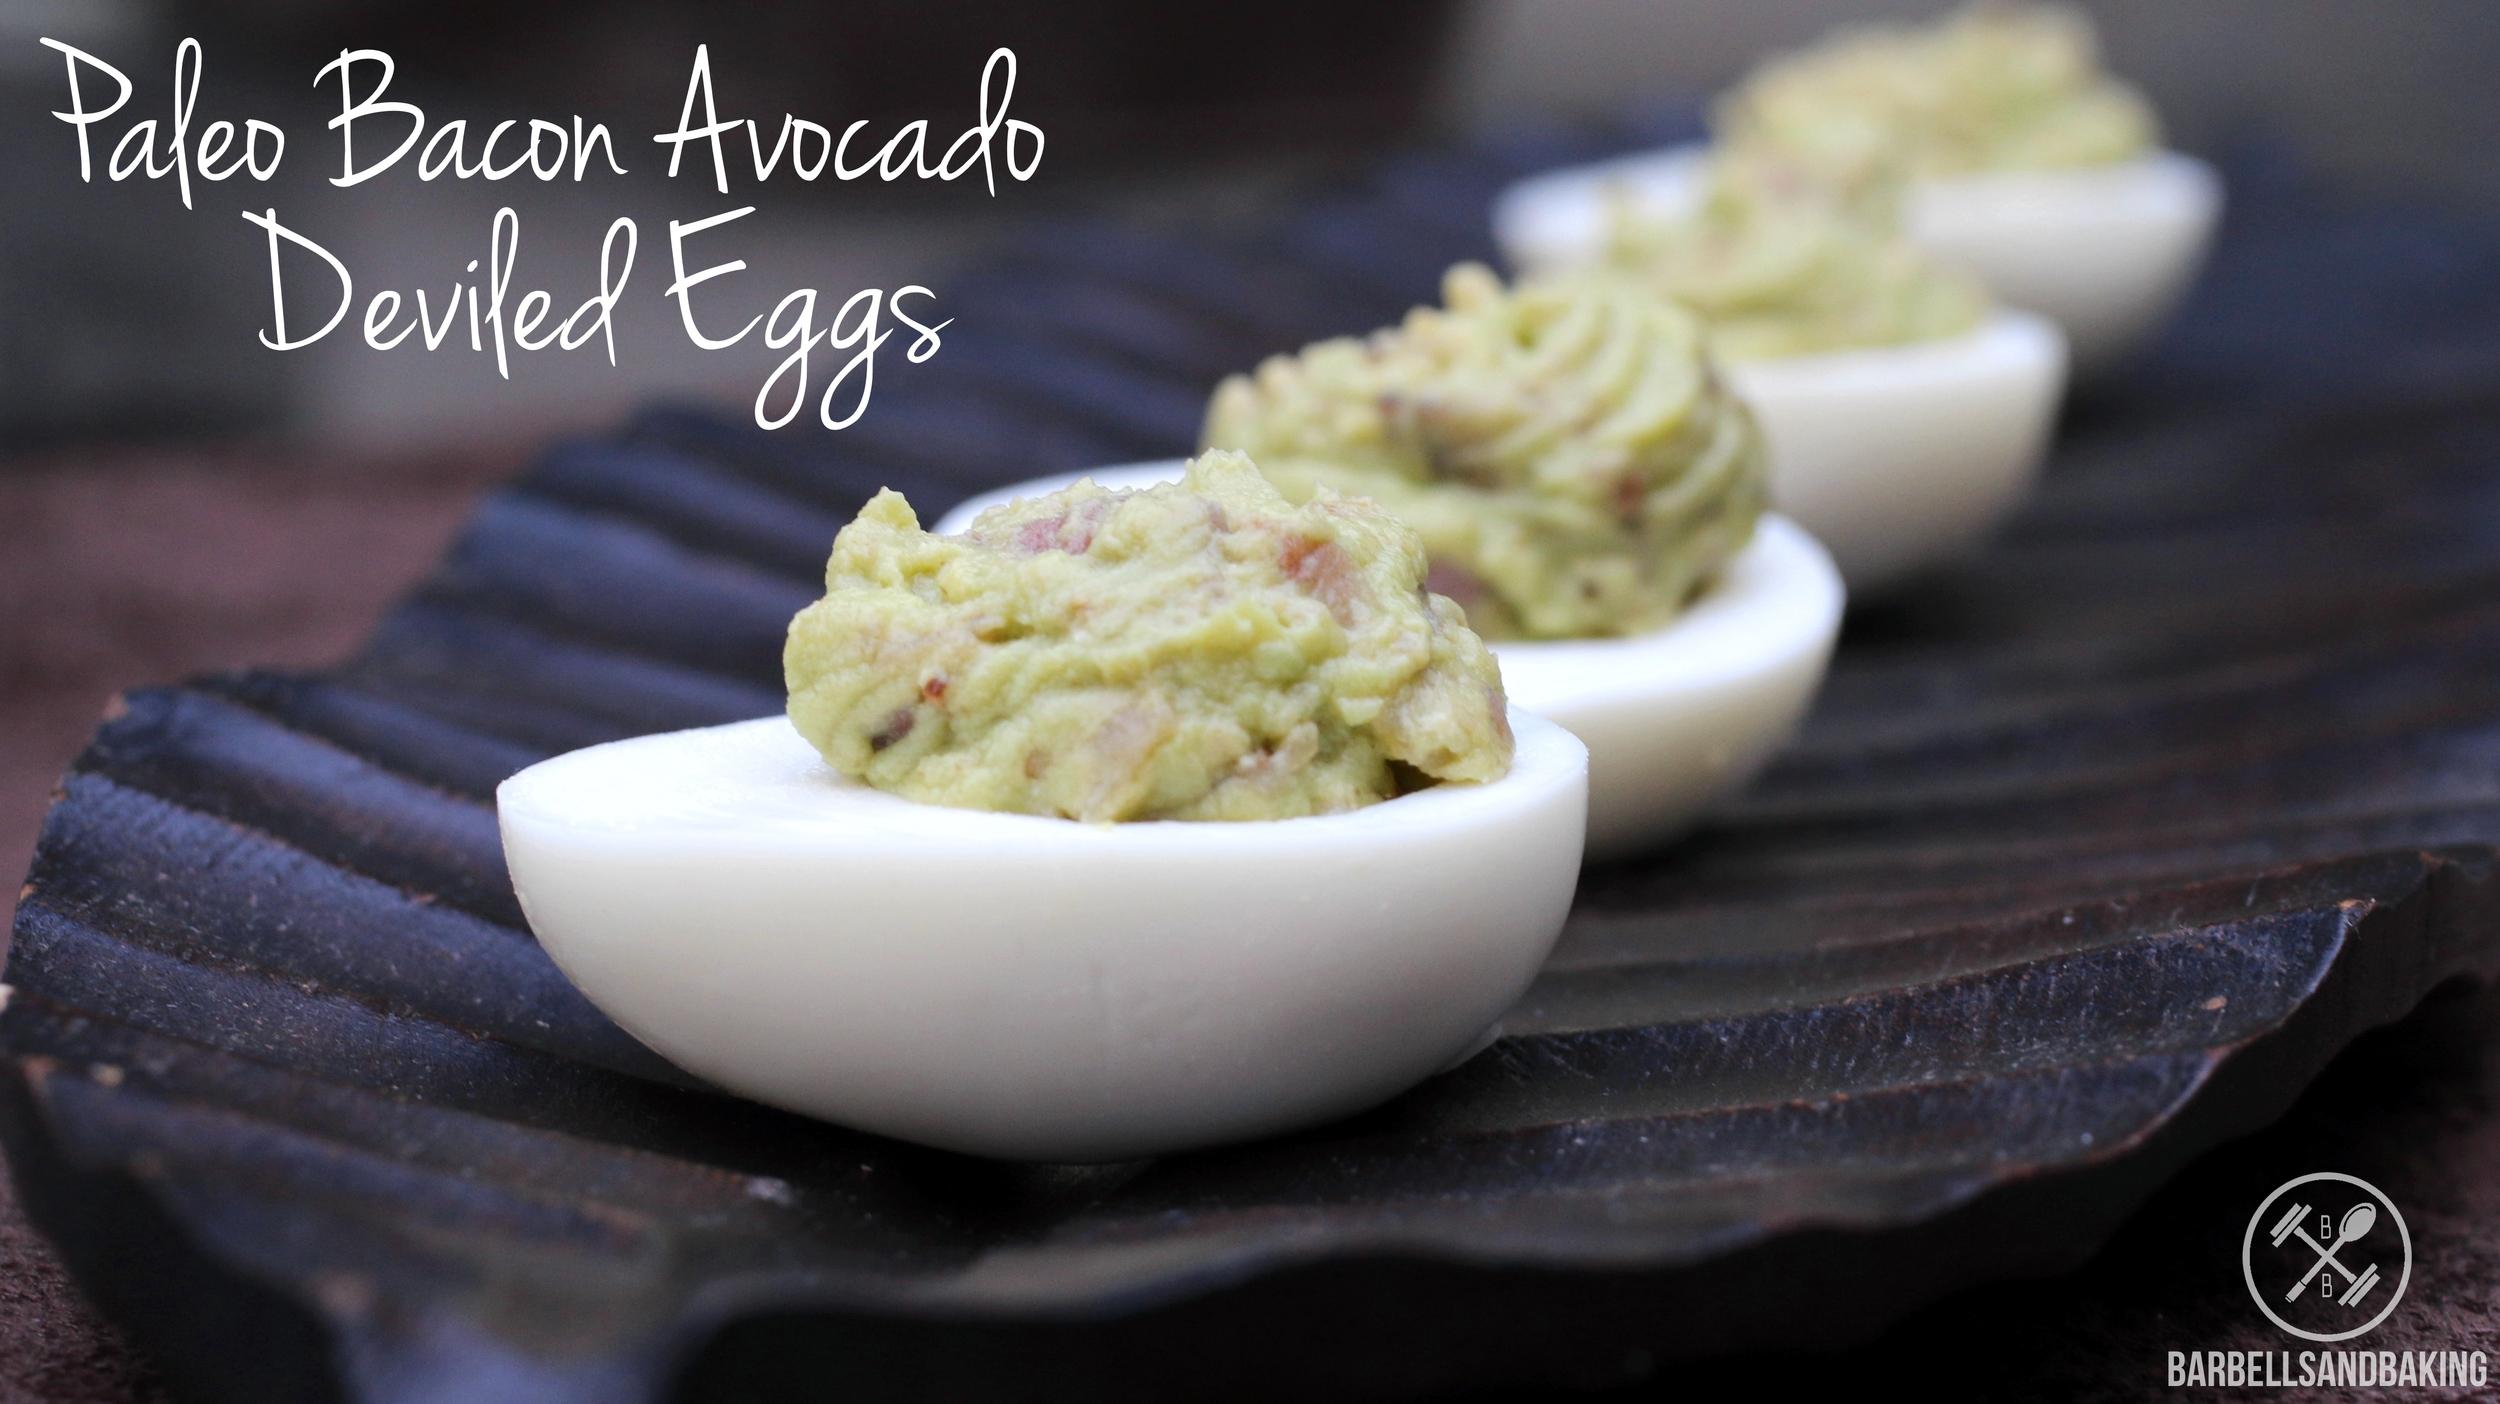 Paleo Bacon Avocado Deviled Eggs | www.barbellsandbaking.com